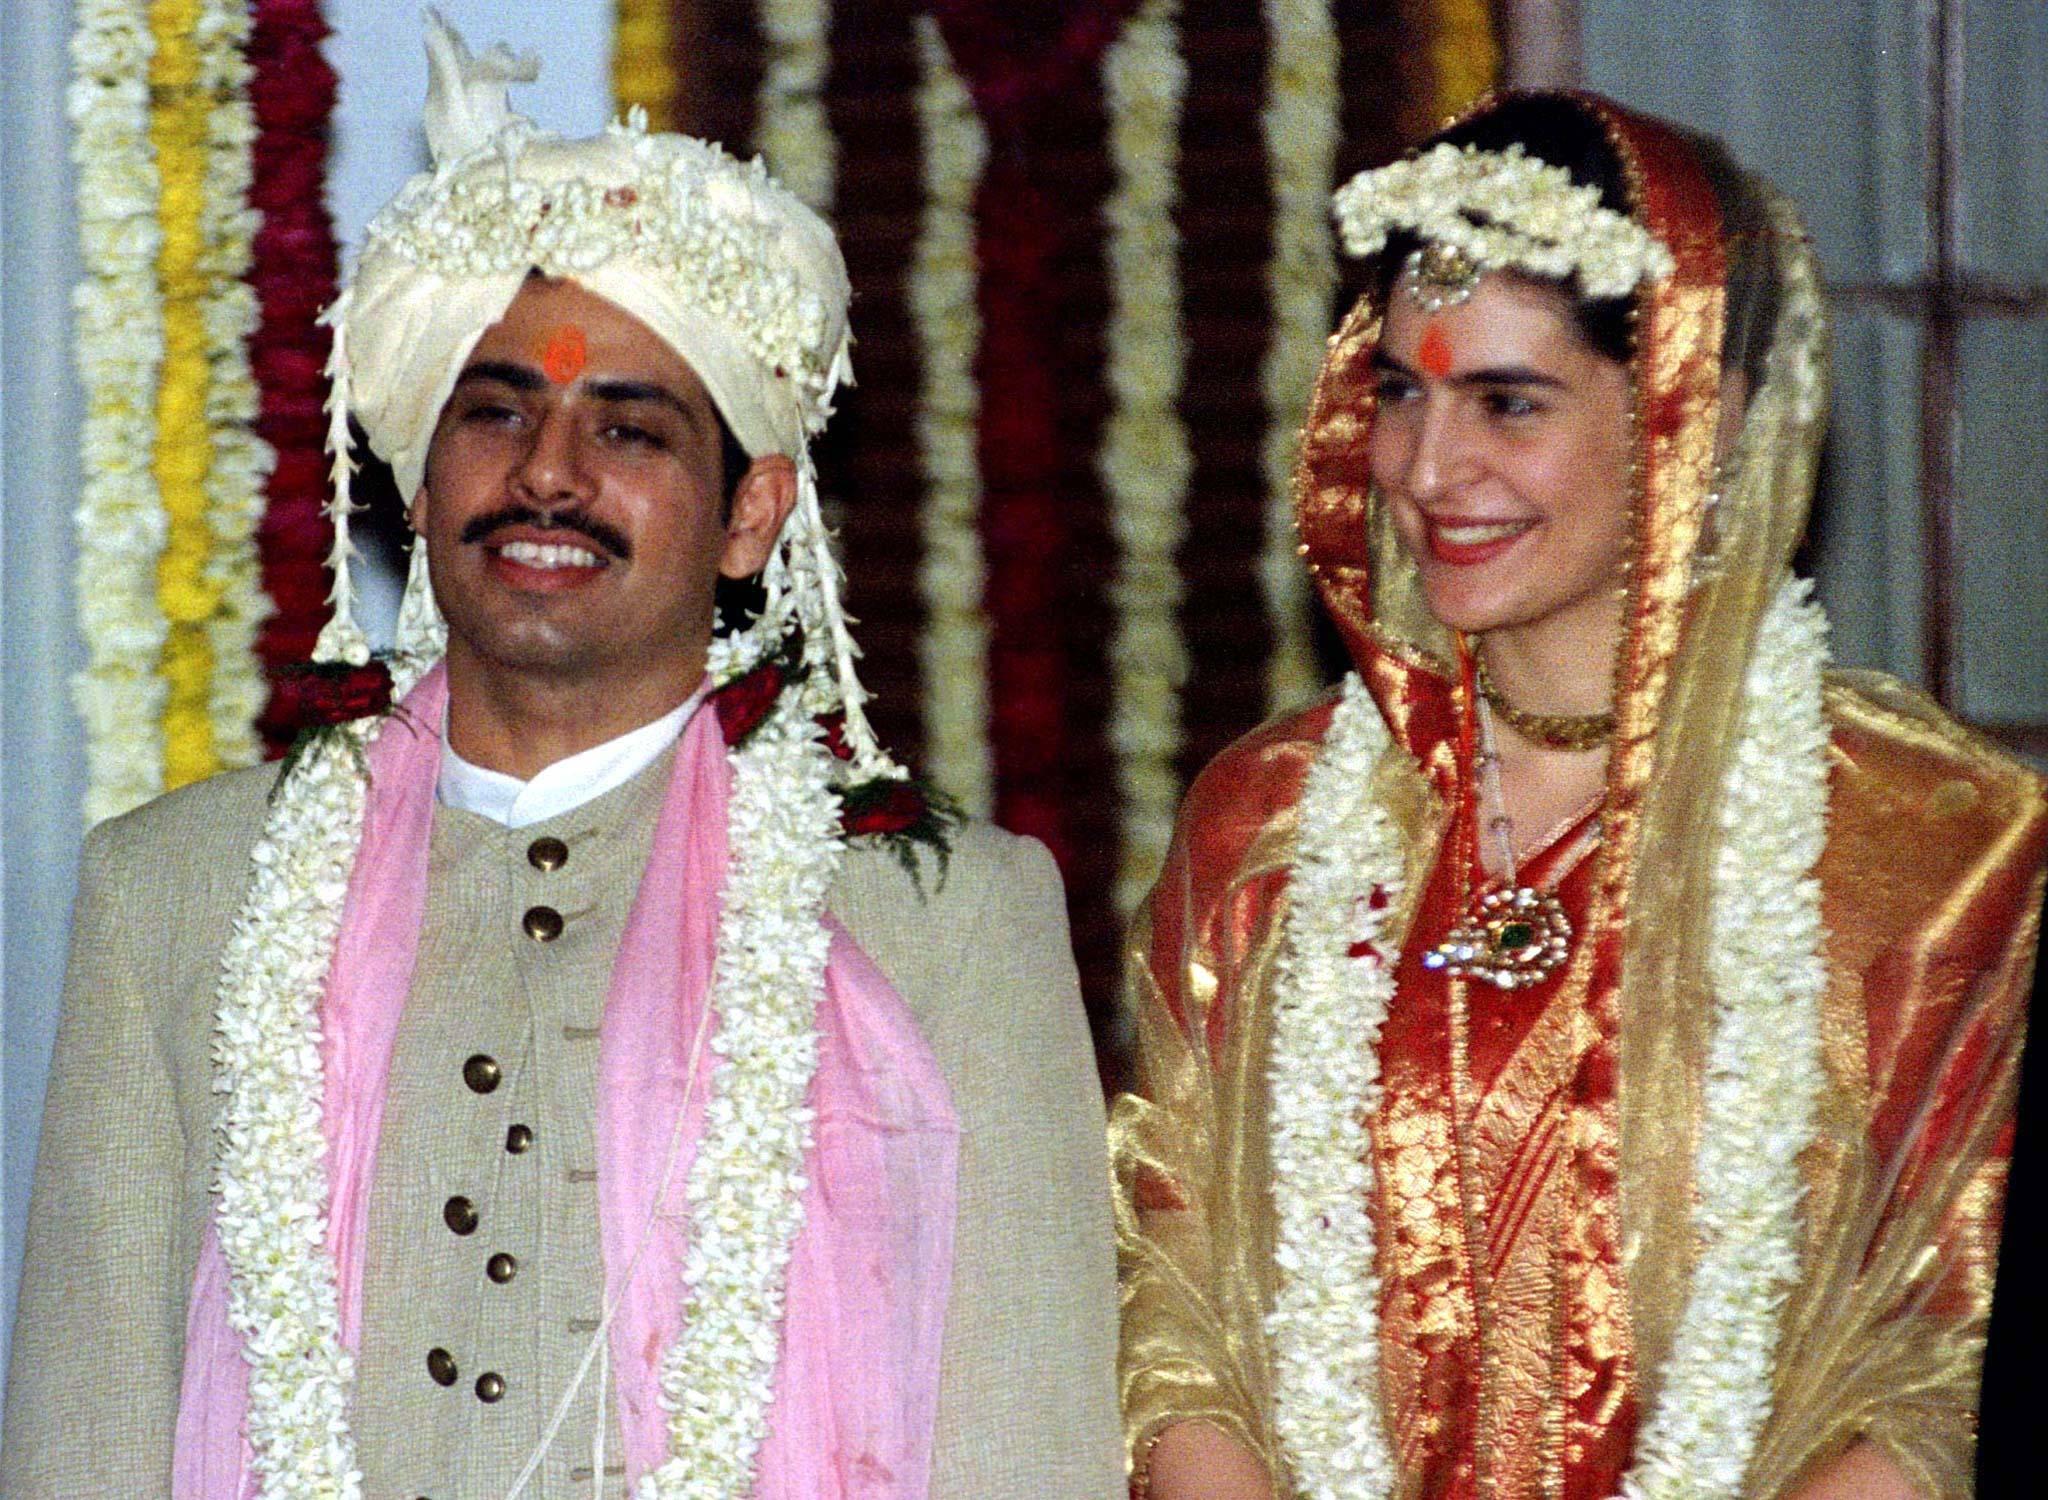 Priyanka Gandhi (R), daughter of former Indian prime minister Rajiv Gandhi, with her husband Robert